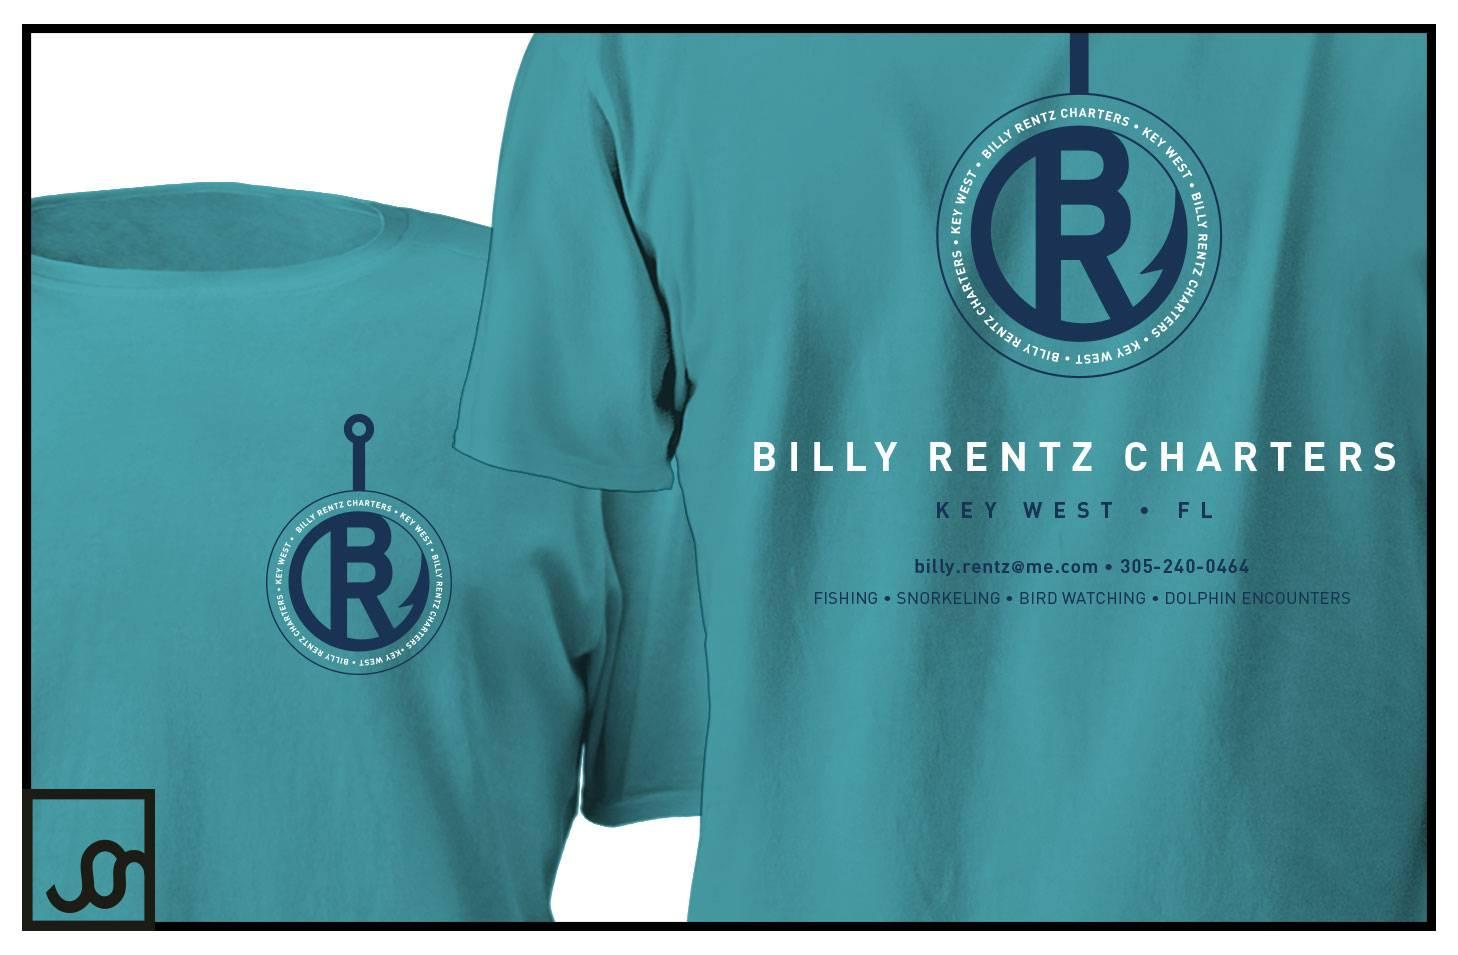 Billy Rentz Charters